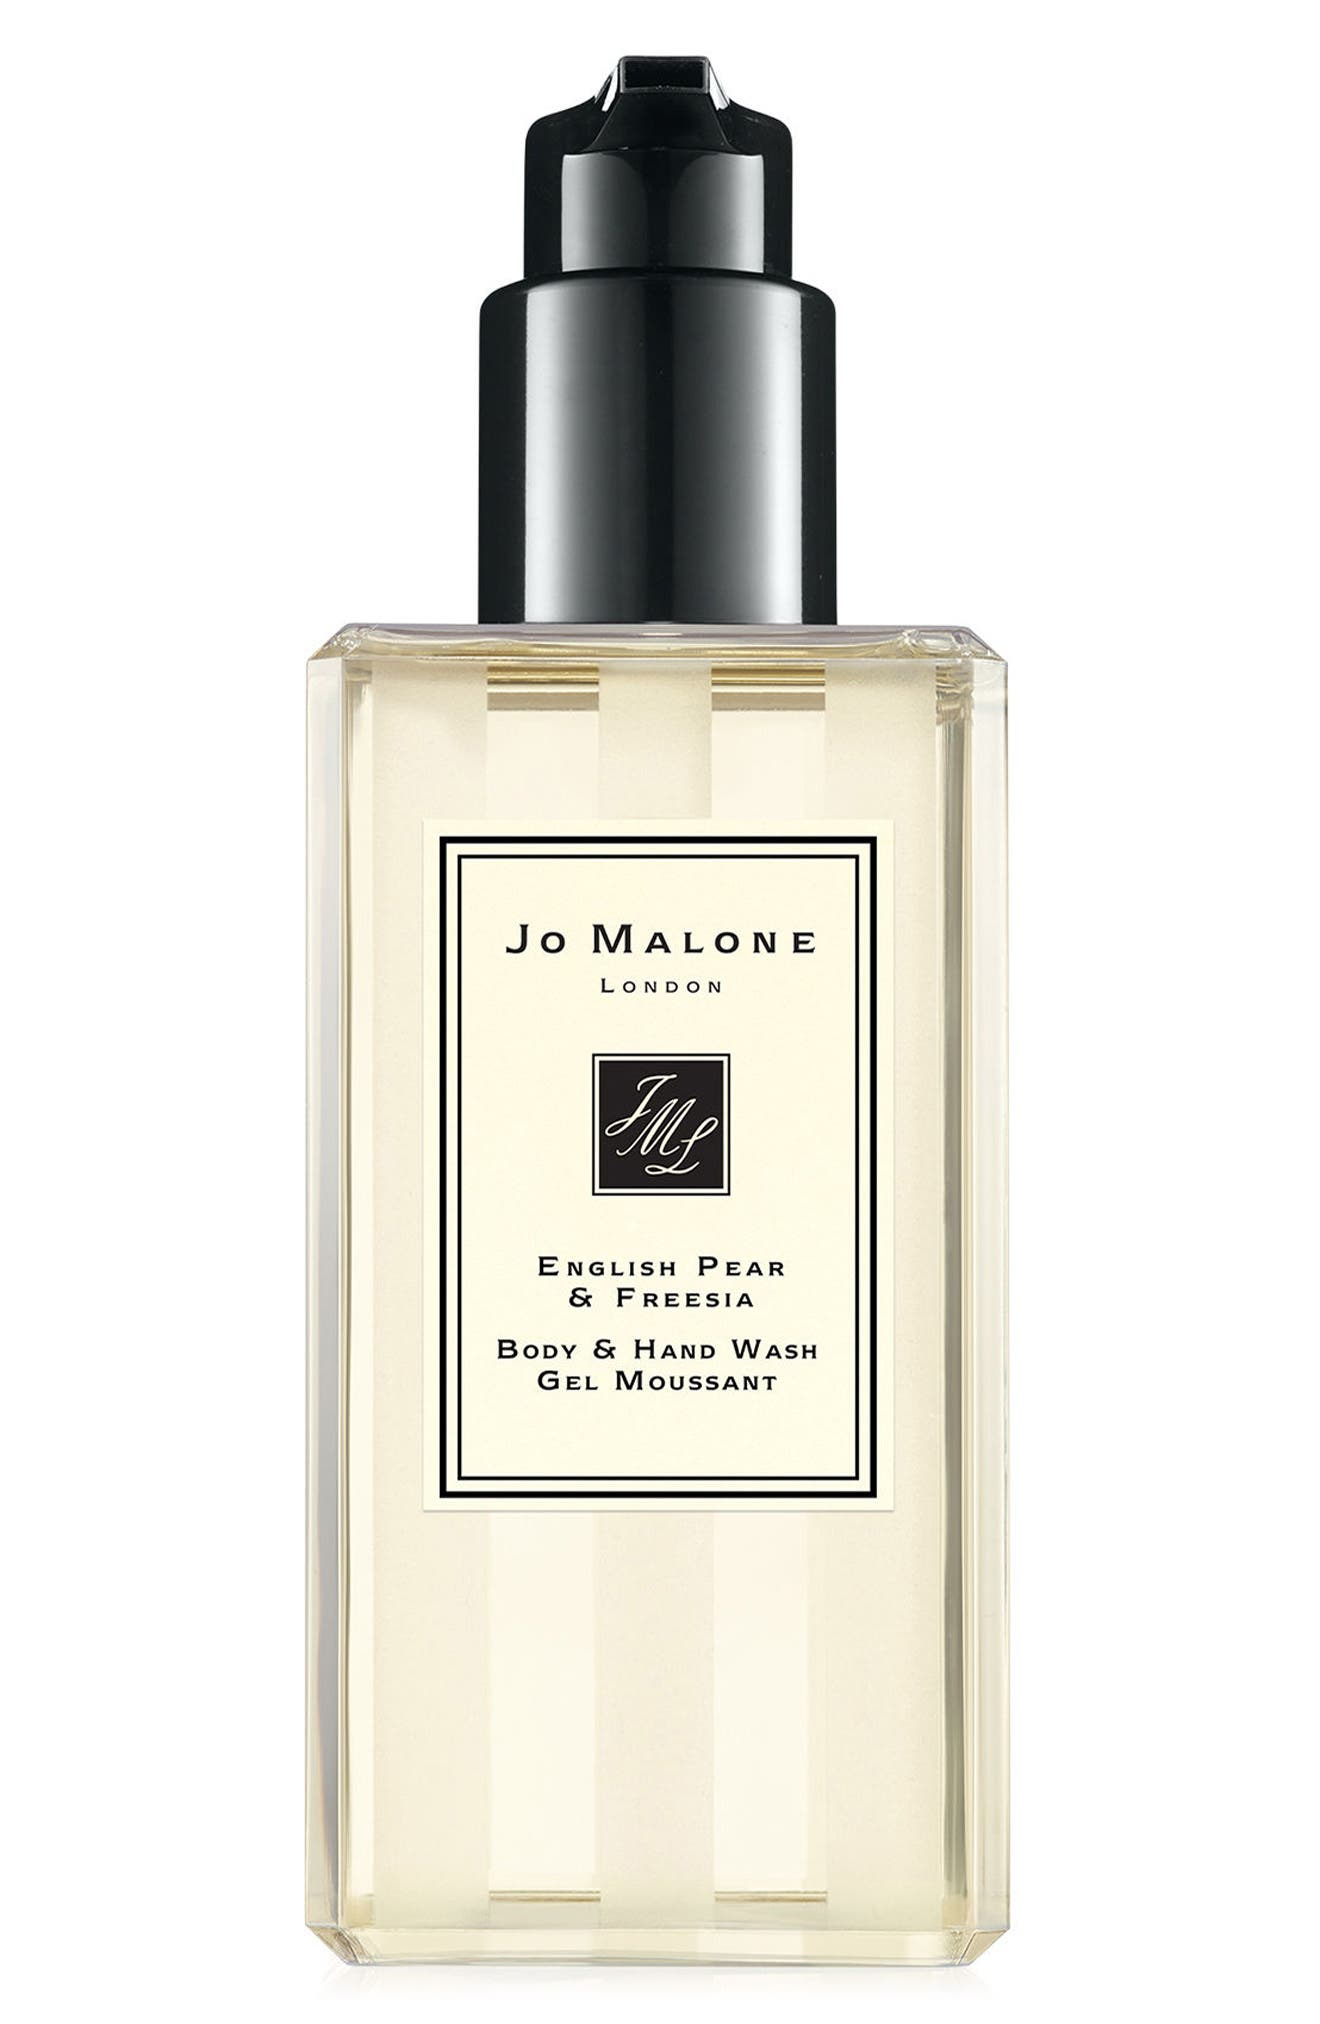 Jo Malone London™ English Pear & Freesia Body & Hand Wash